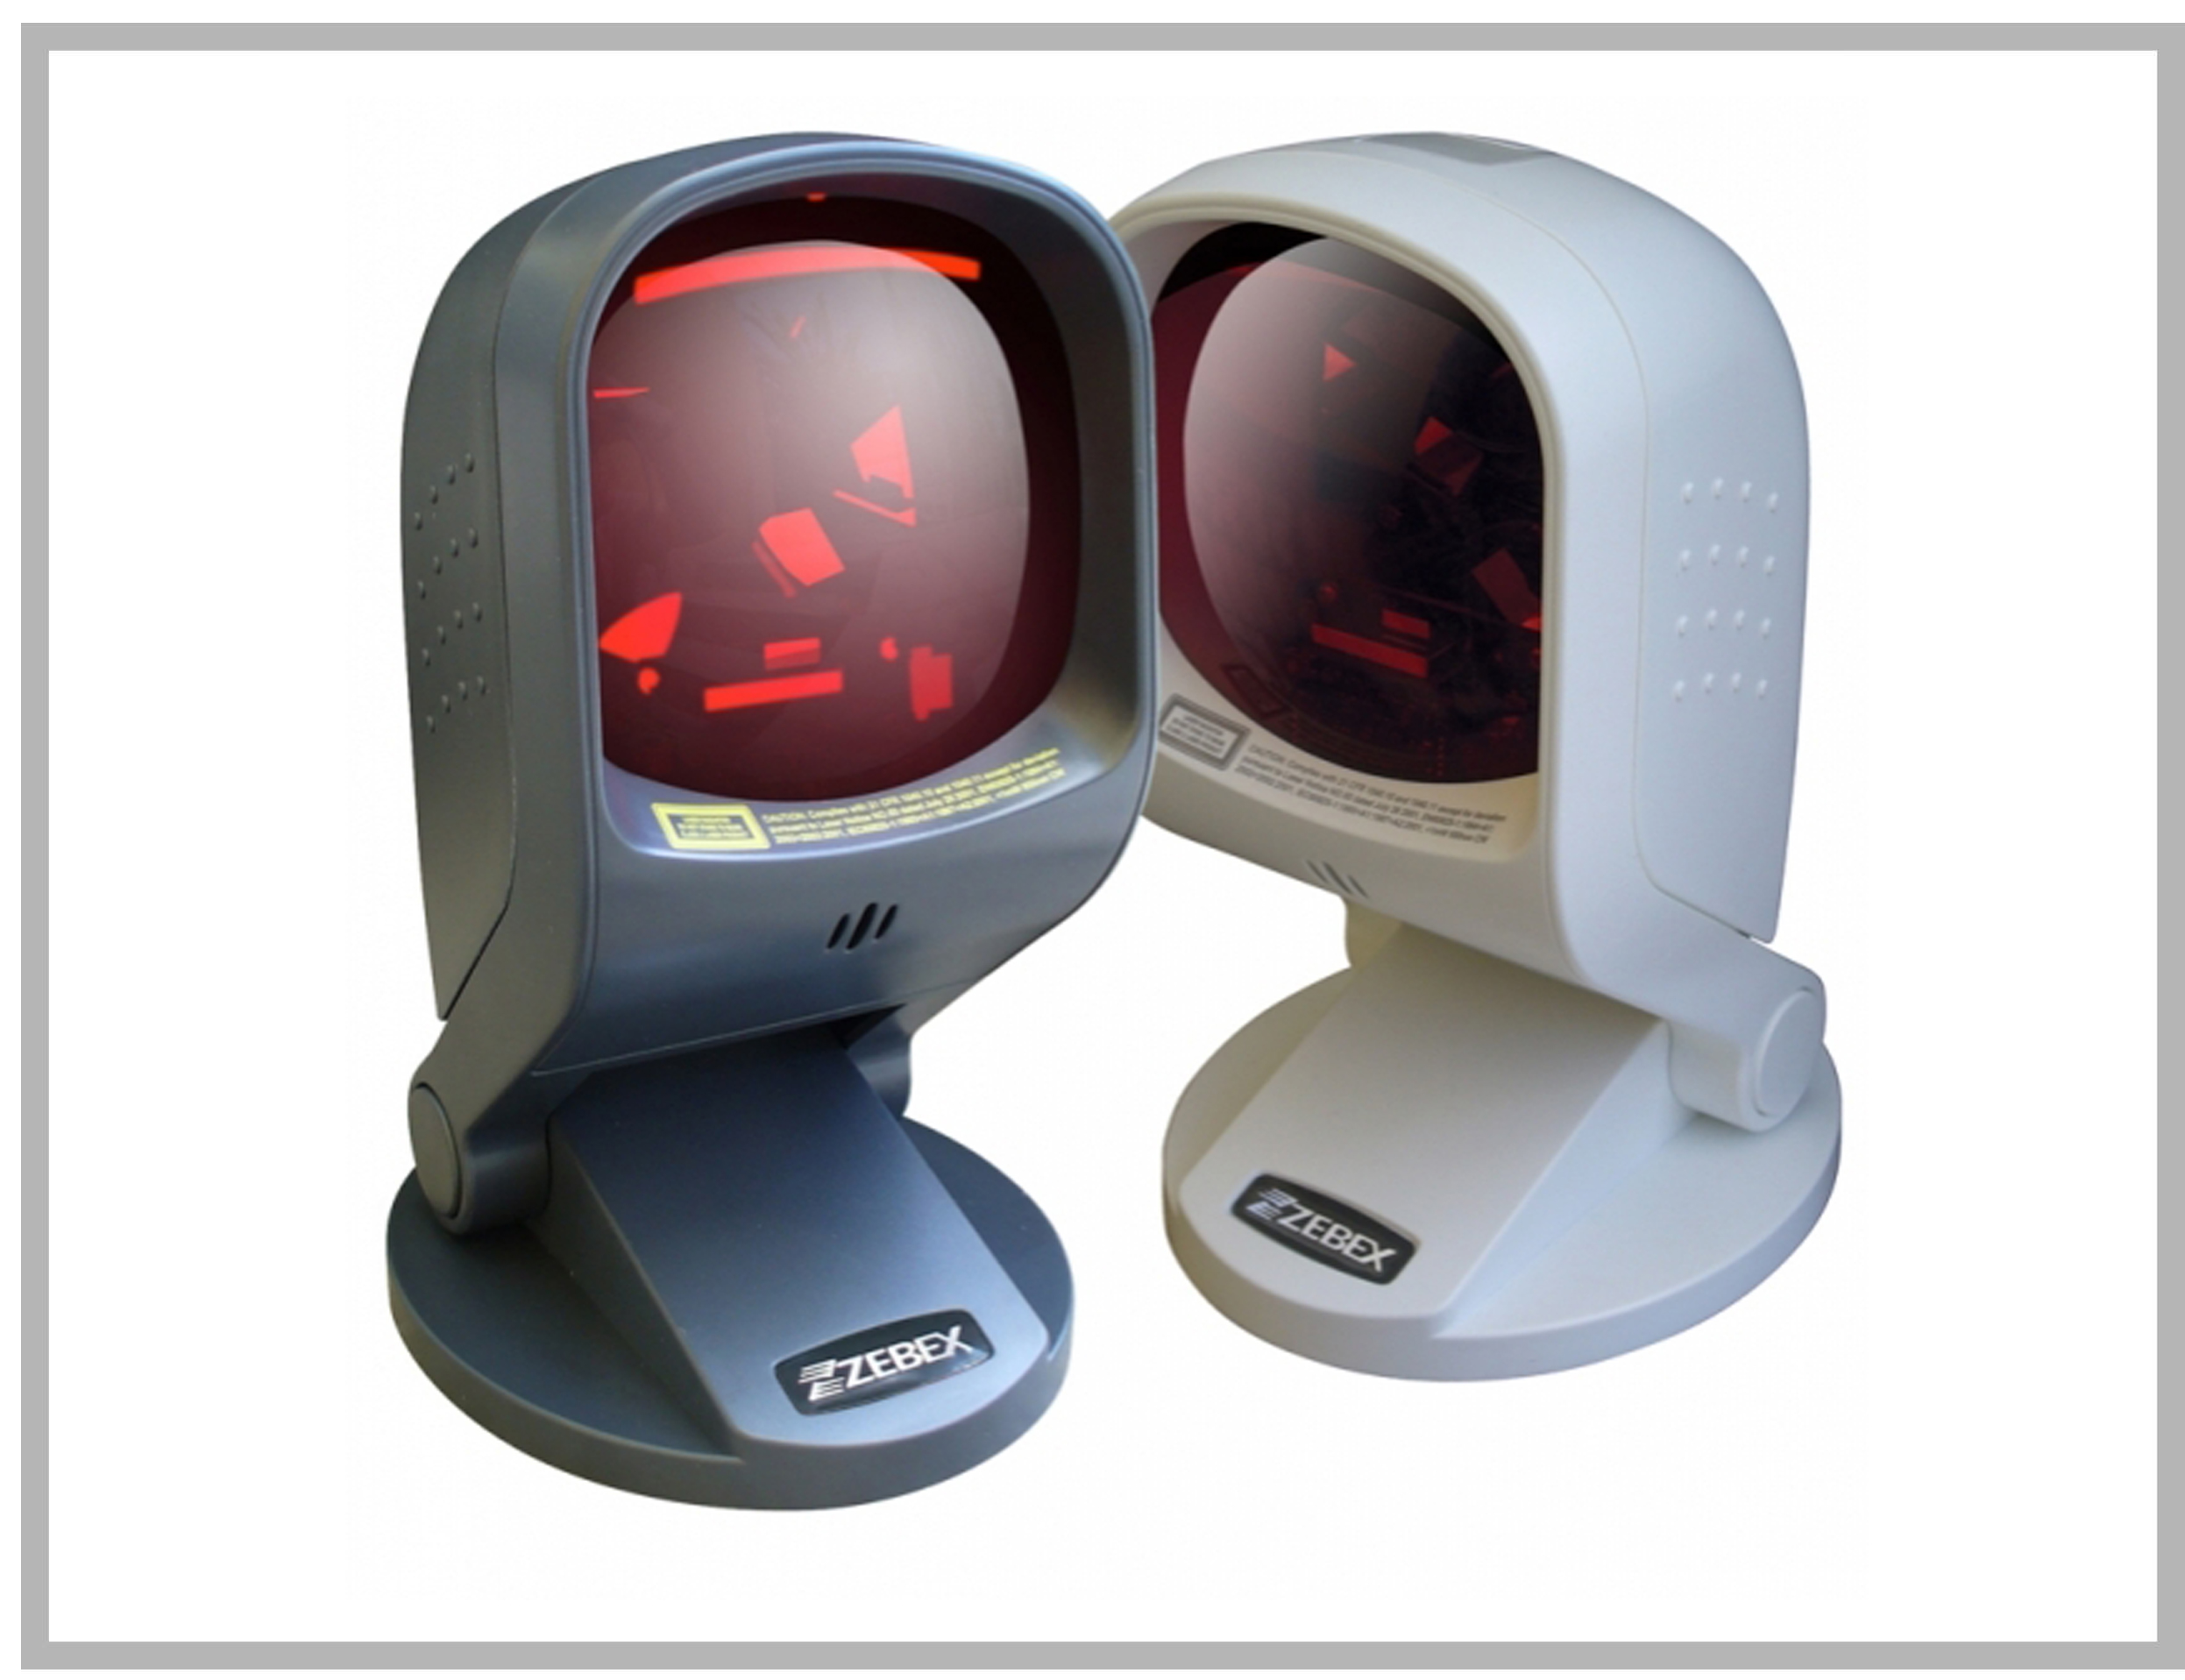 Honeywell MS3580 YJ-5900